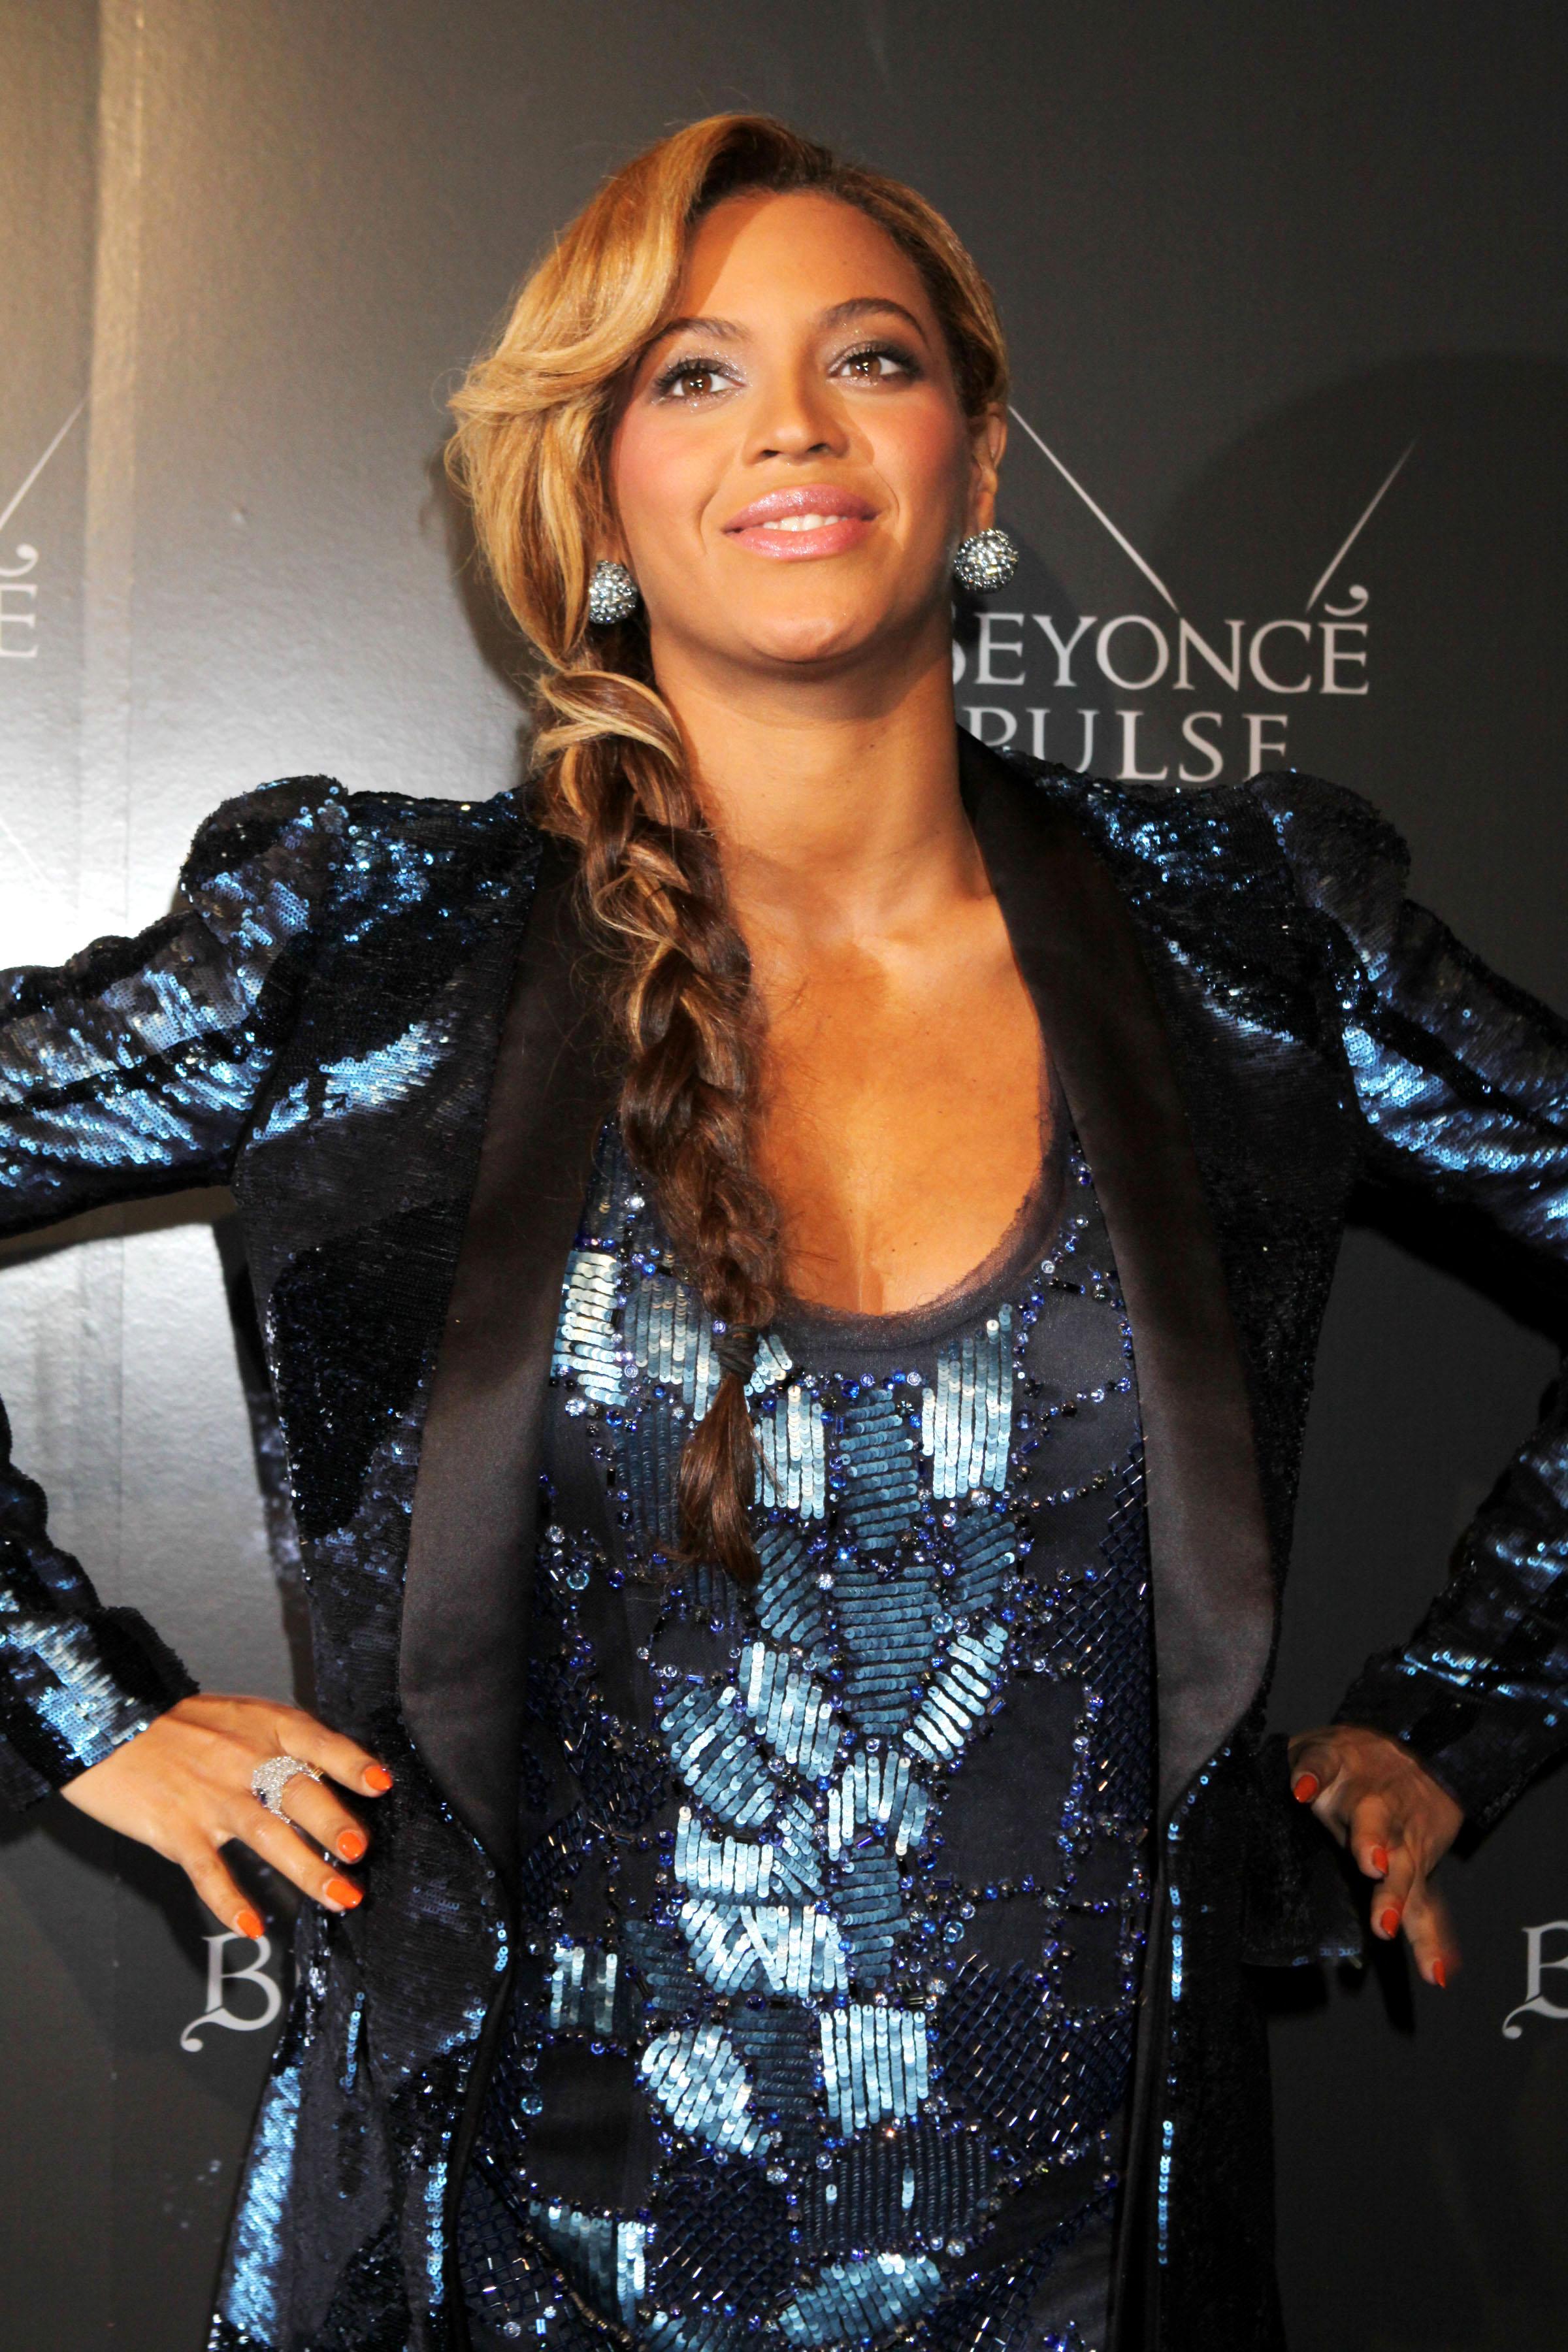 FP 7916539 Beyonce Pulse NYC 14 24